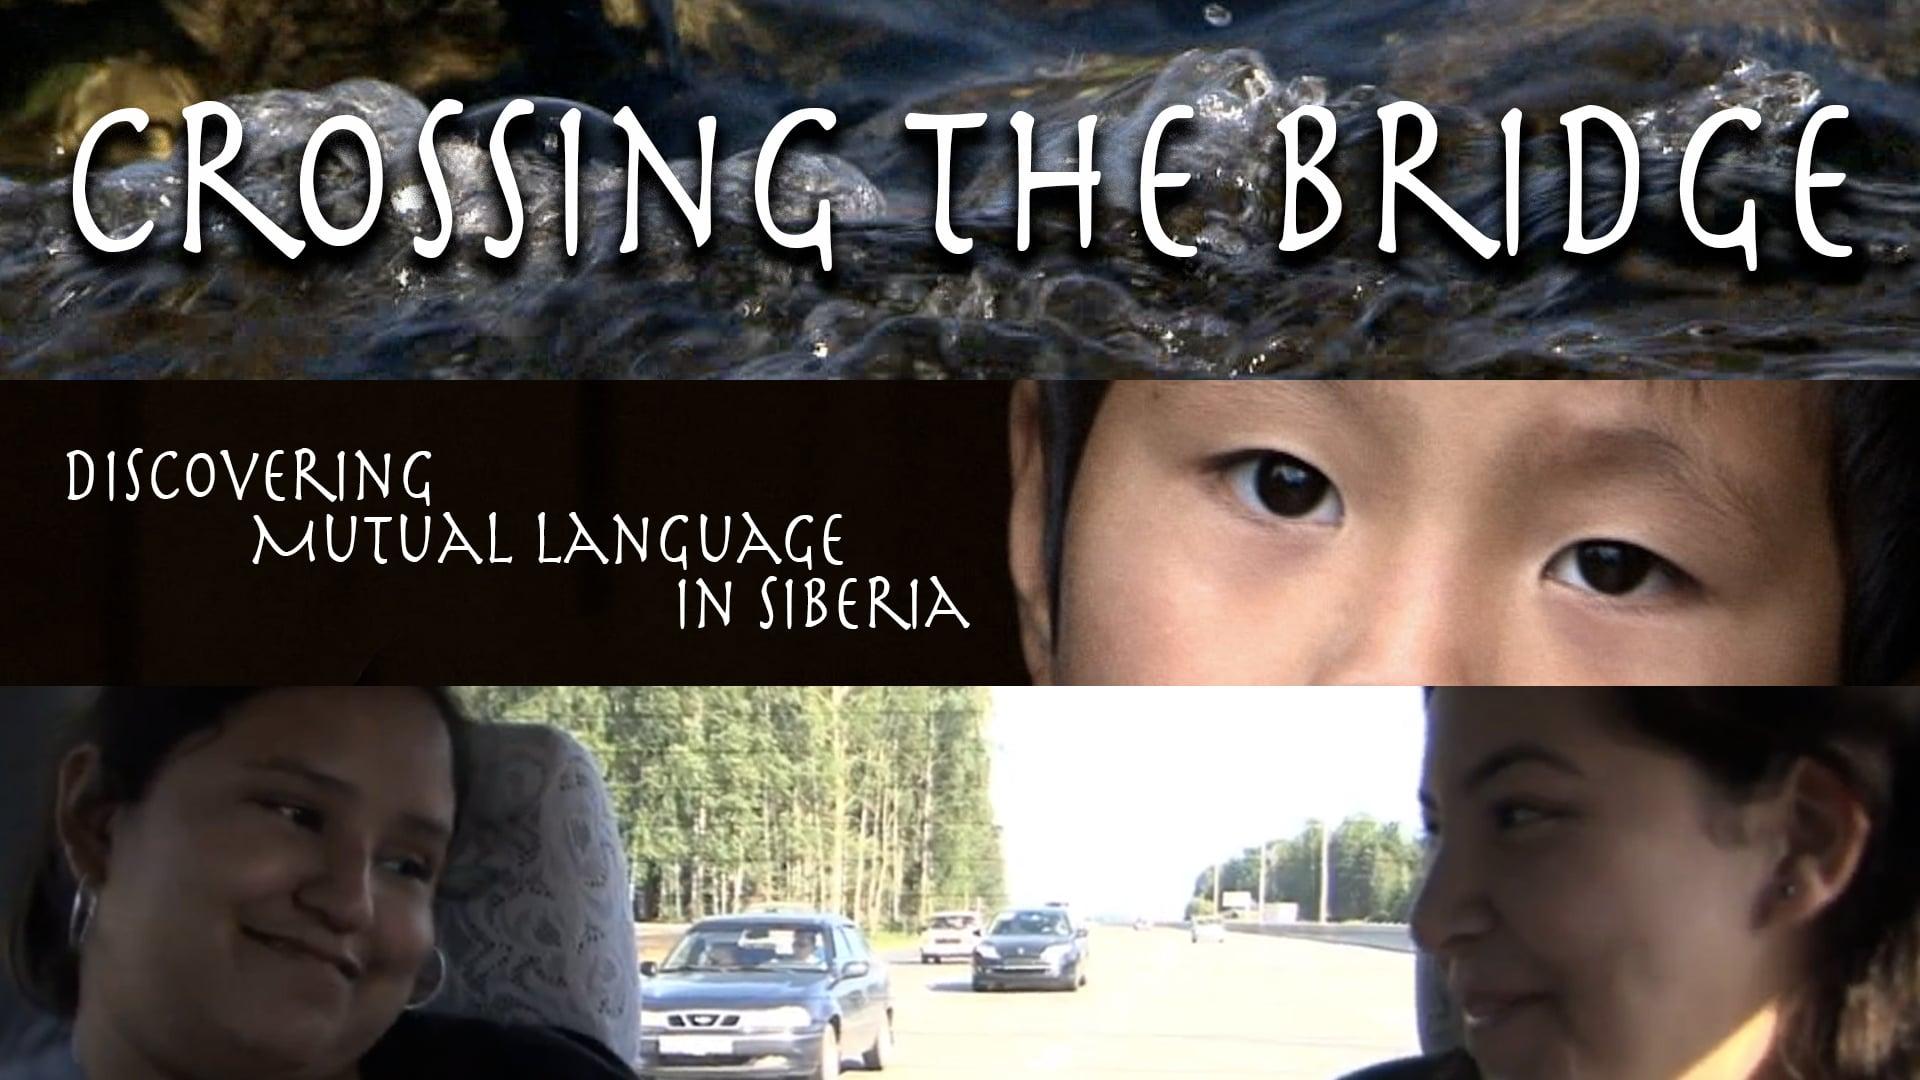 Crossing the Bridge - Discovering Mutual Language in Siberia (Backup)